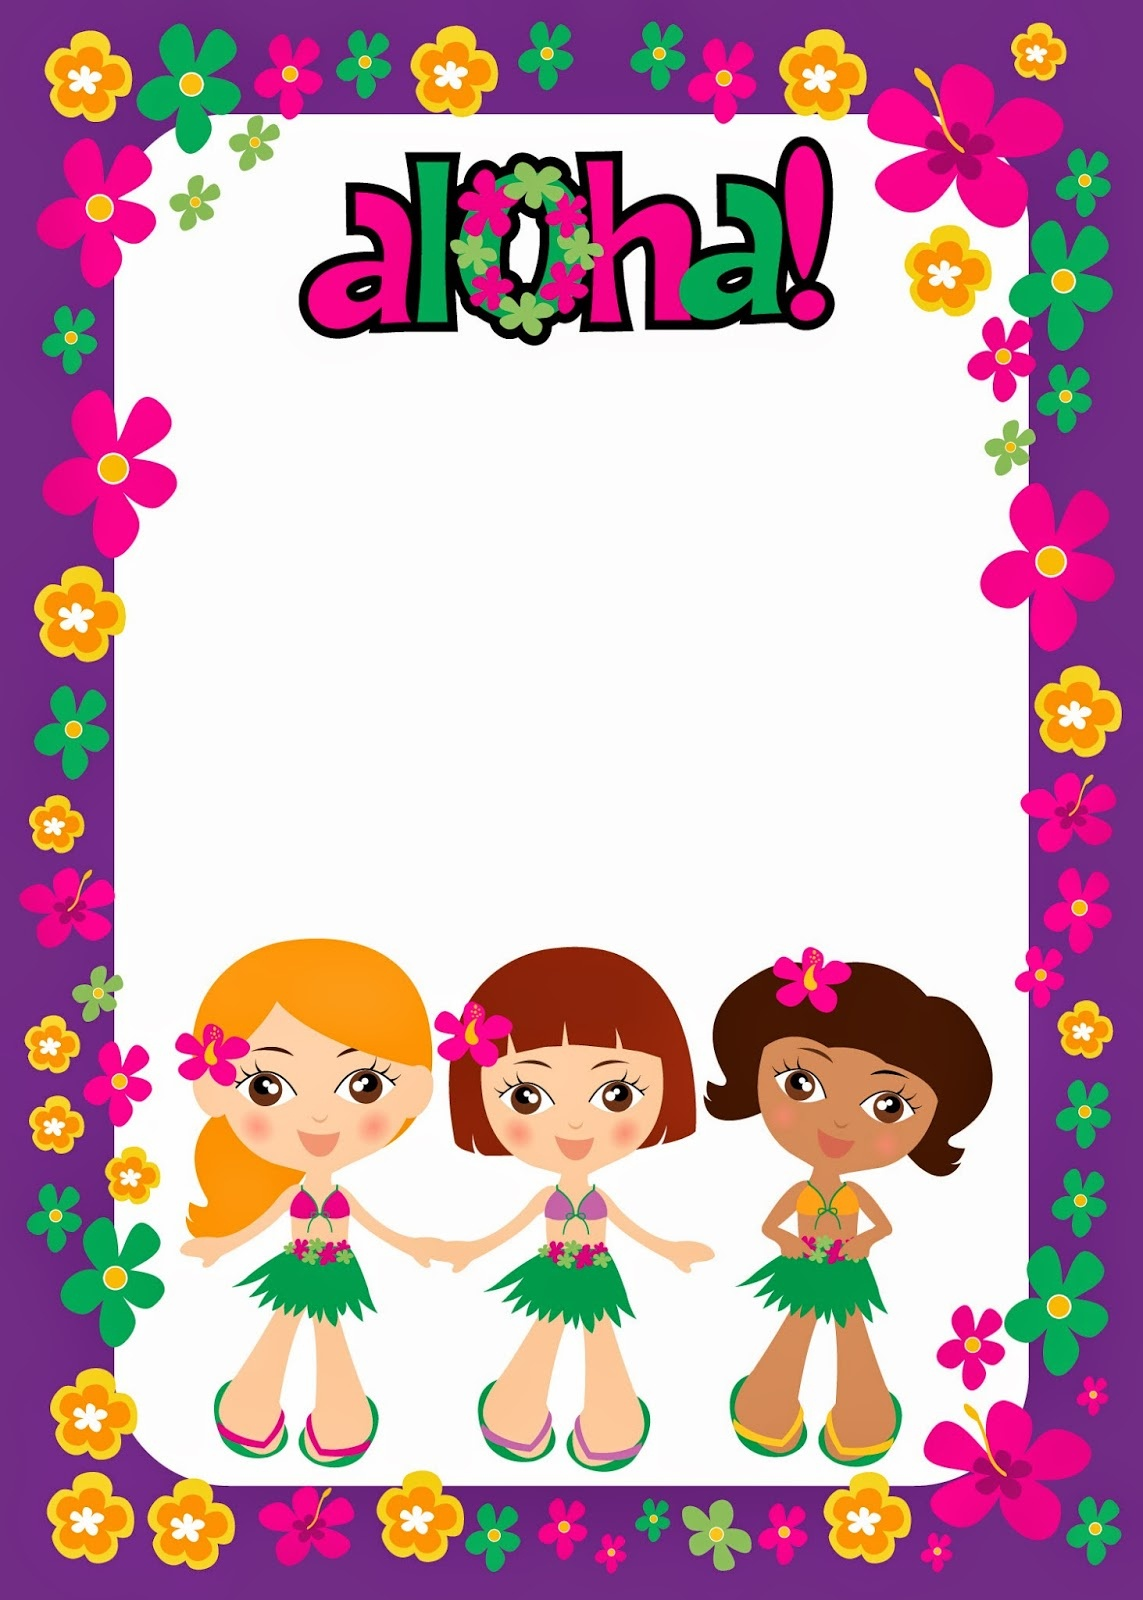 Luau For Girls: Free Printable Invitations. - Oh My Fiesta! In English - Free Luau Printables